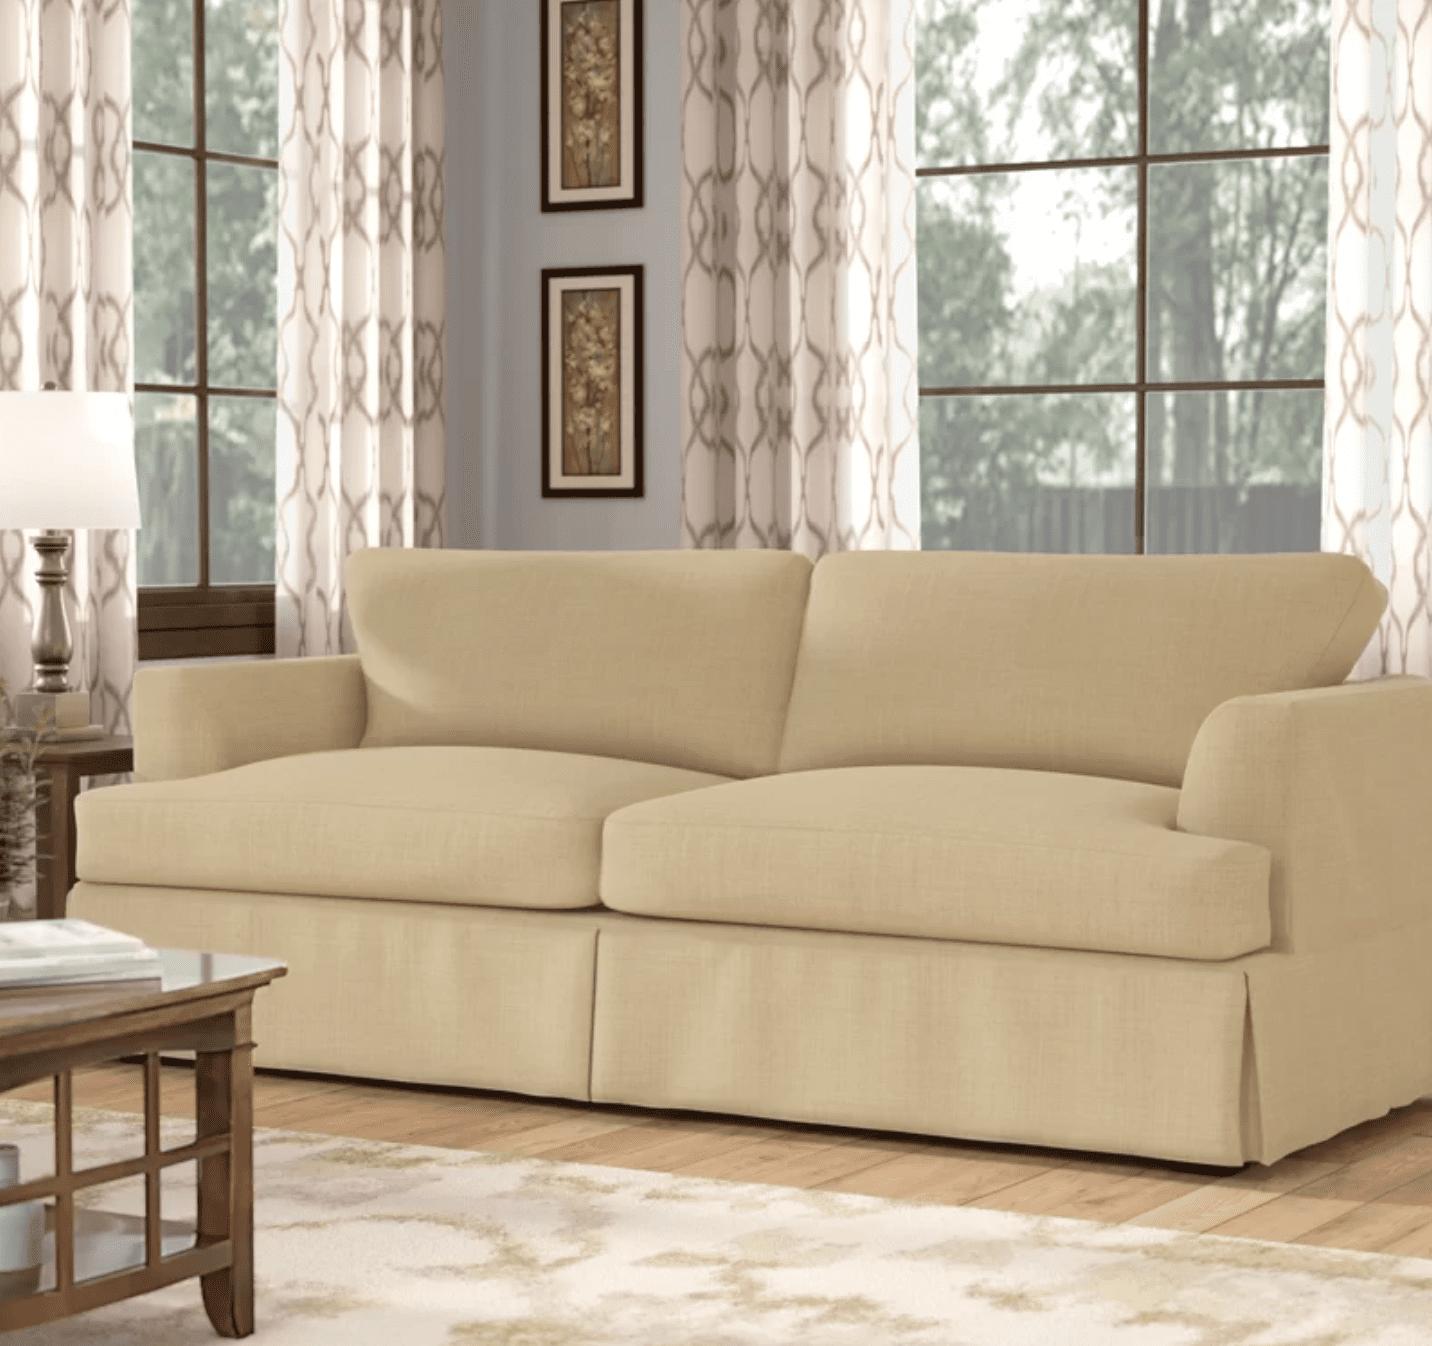 Wayfair Custom Upholstery Carly Sofa Bed